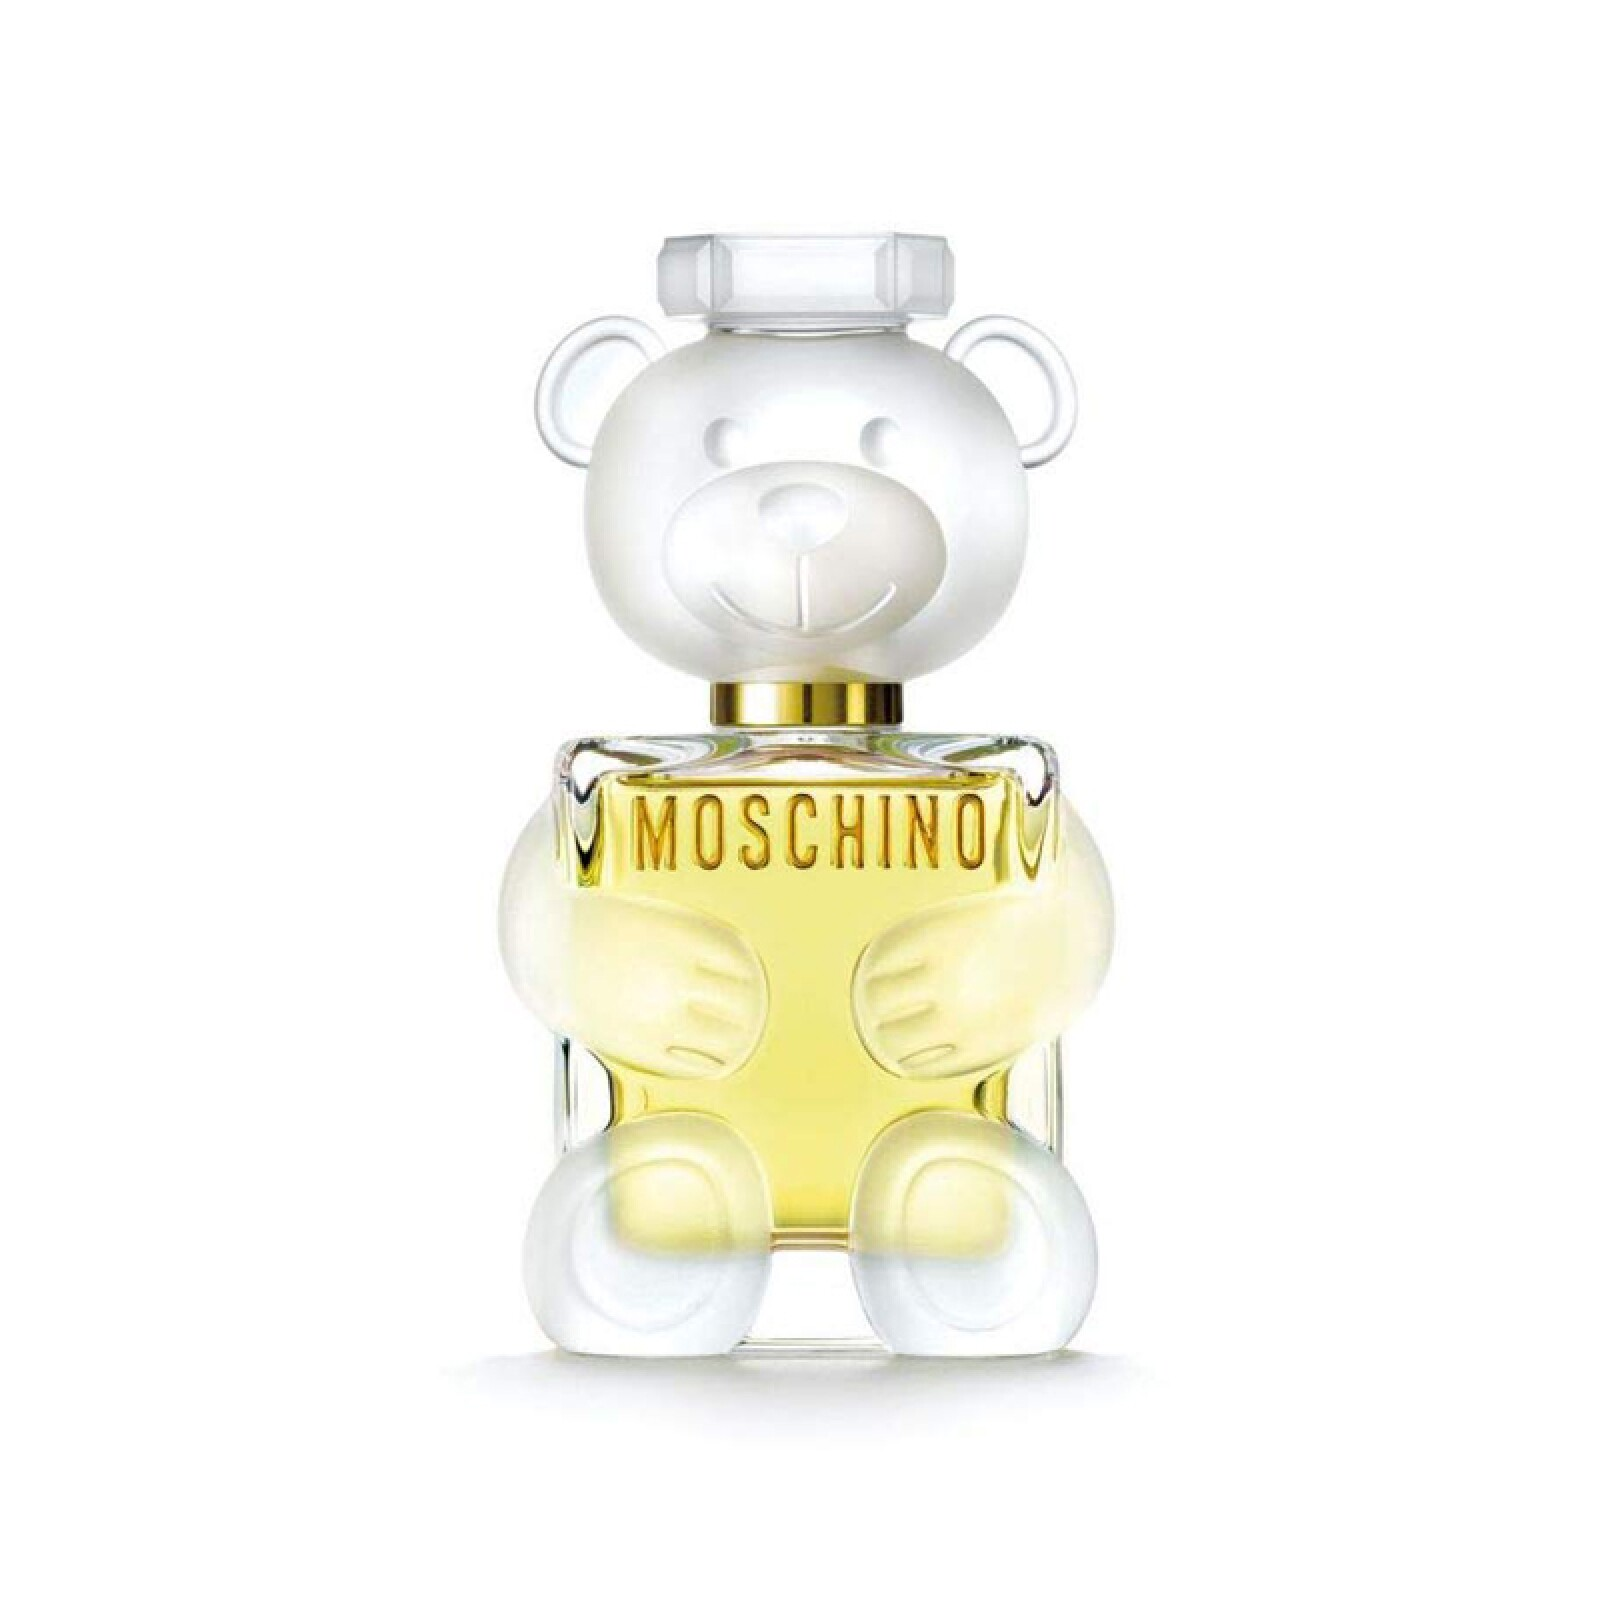 fragancias-perfumes-primavera-aroma-notas-floral-moschino